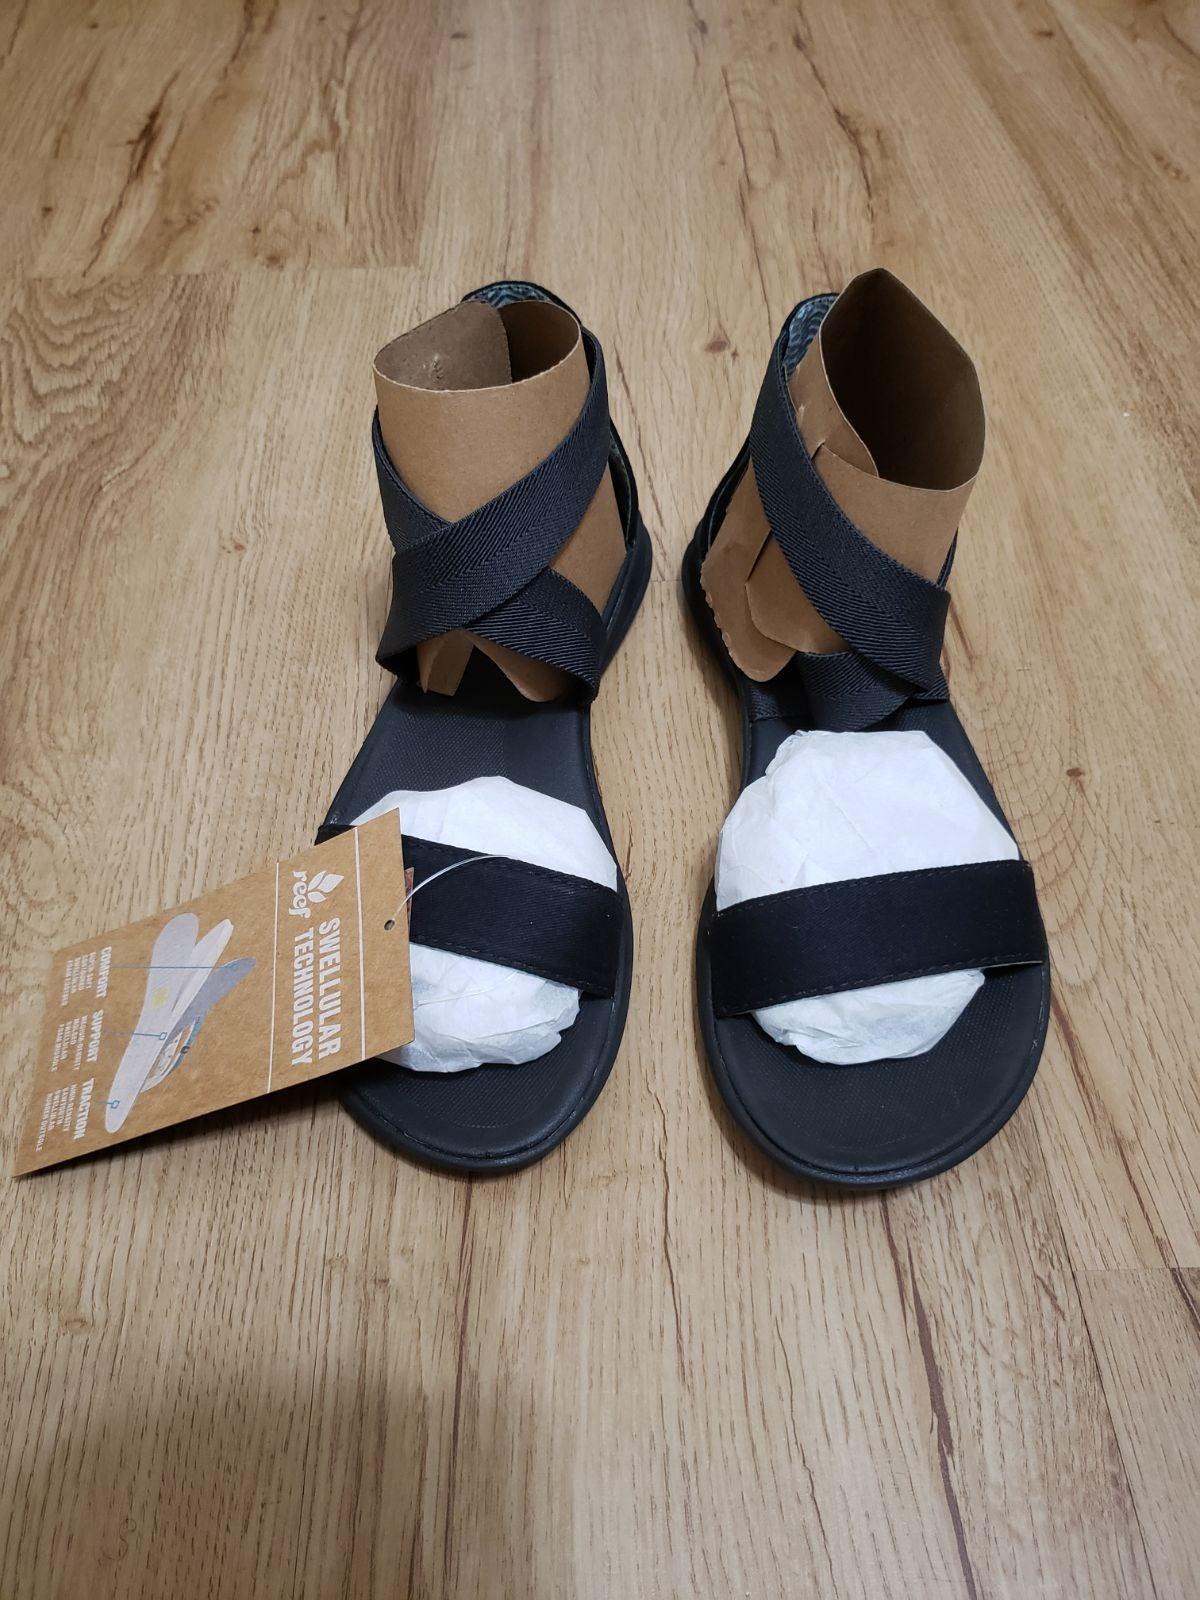 Reef Women's Rover Hi Huarache Sandals